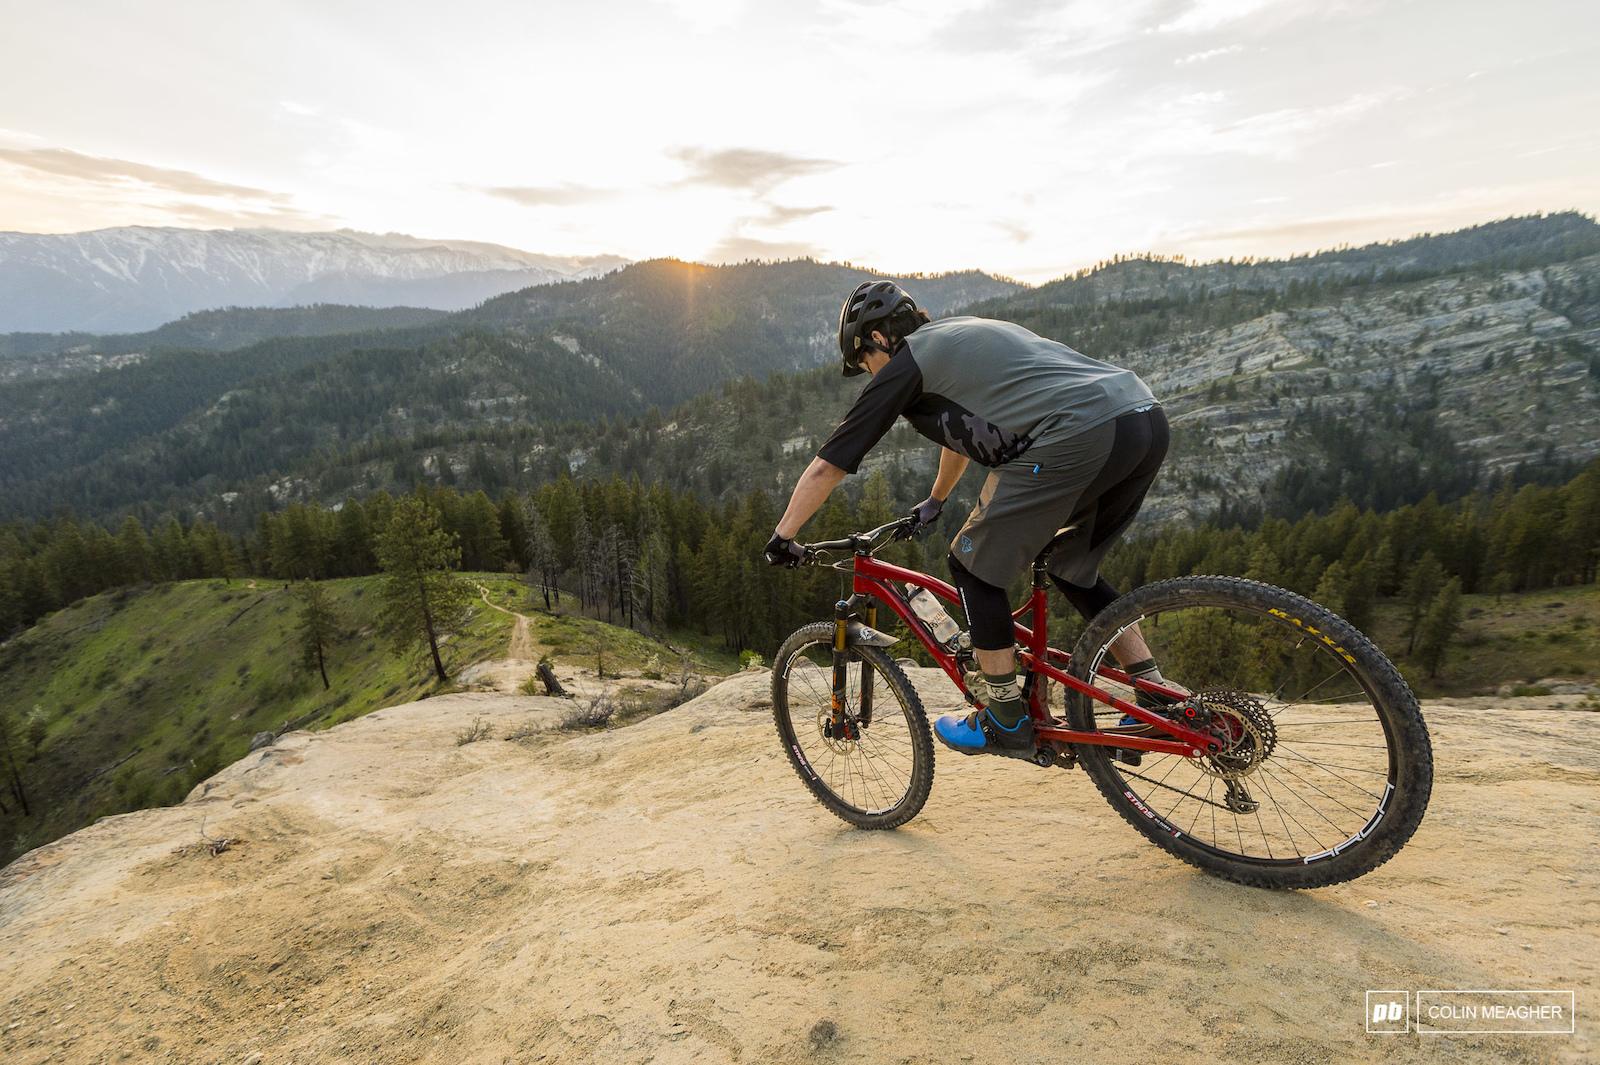 Jameson Florence riding trails in Leavenworth WA